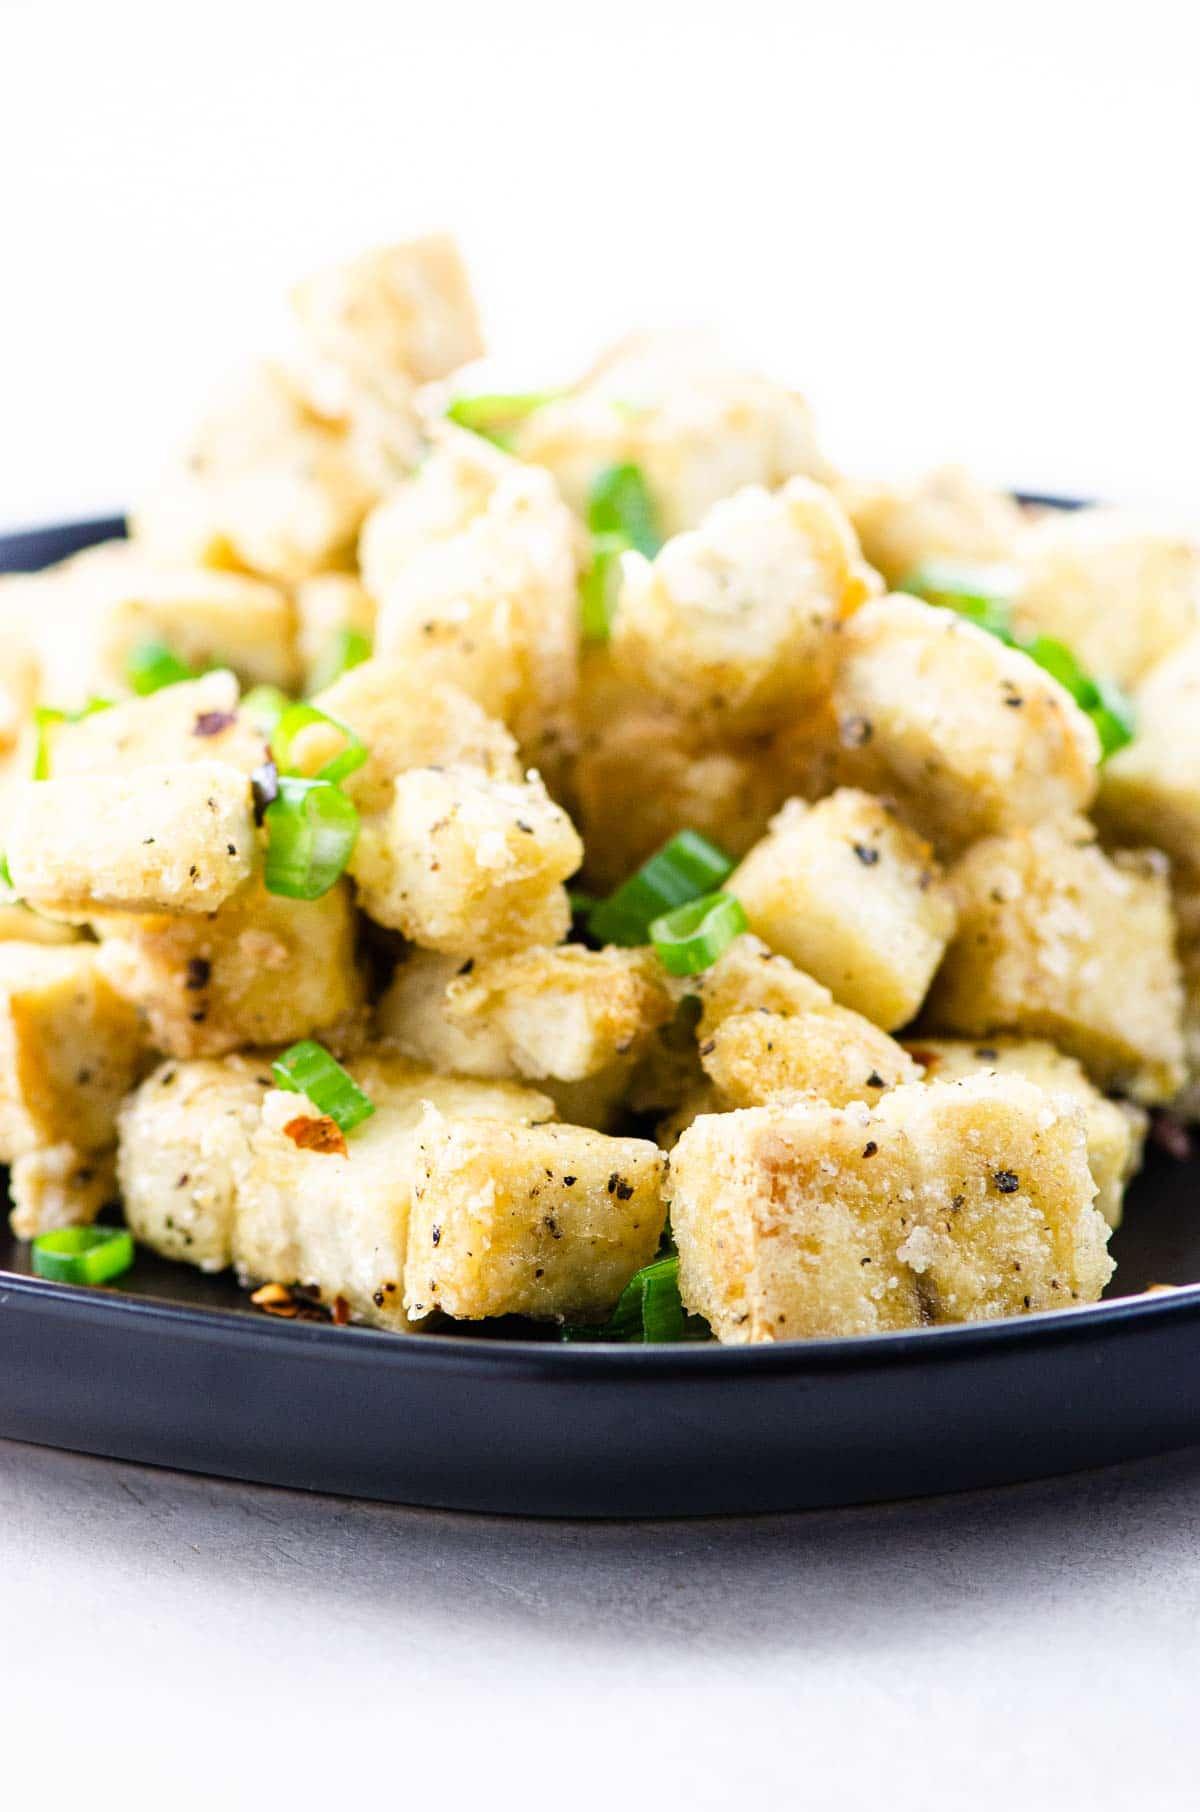 salt and pepper tofu on a black plate